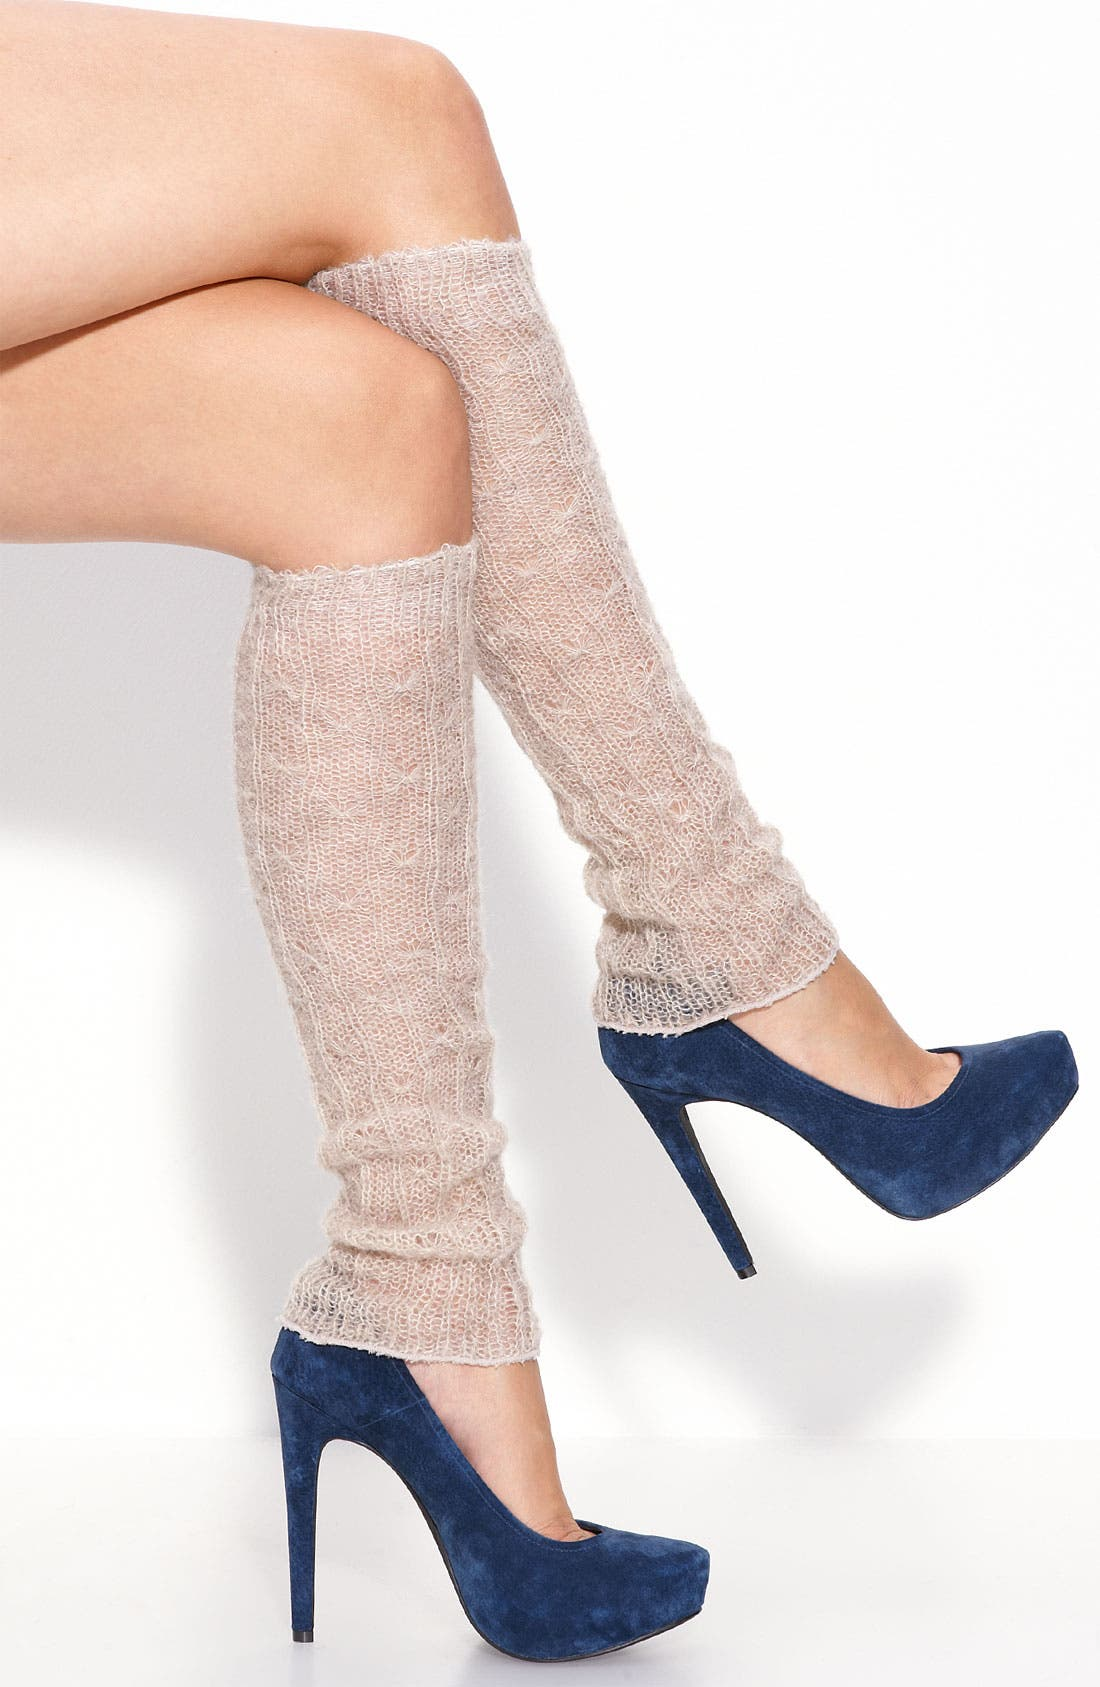 Main Image - Oroblu 'Ariel' Leg Warmers